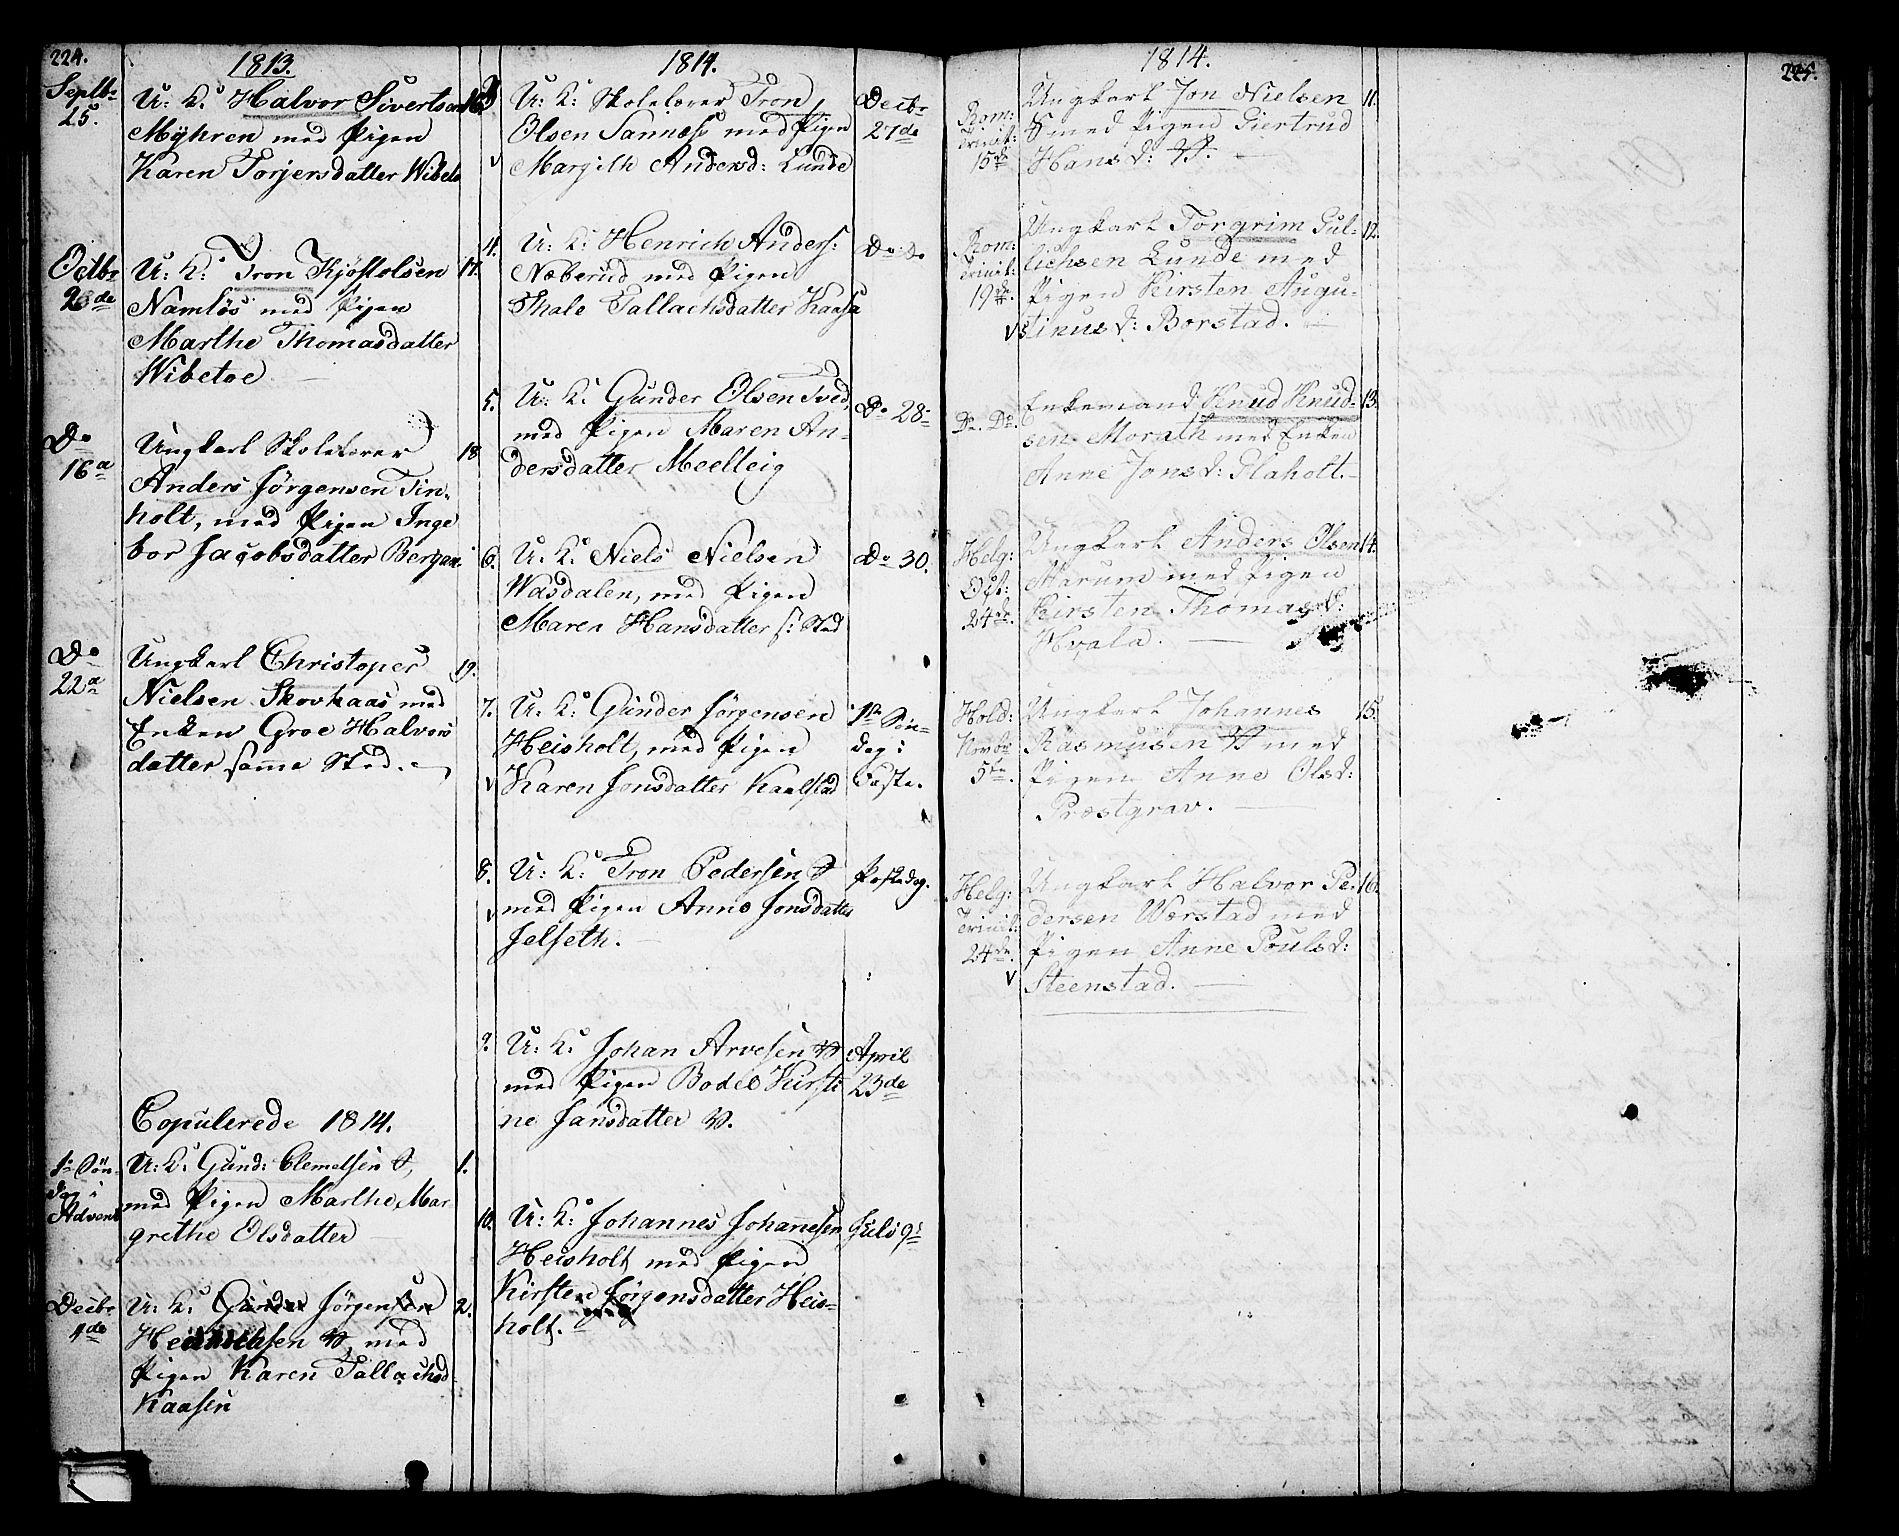 SAKO, Holla kirkebøker, F/Fa/L0002: Ministerialbok nr. 2, 1779-1814, s. 224-225